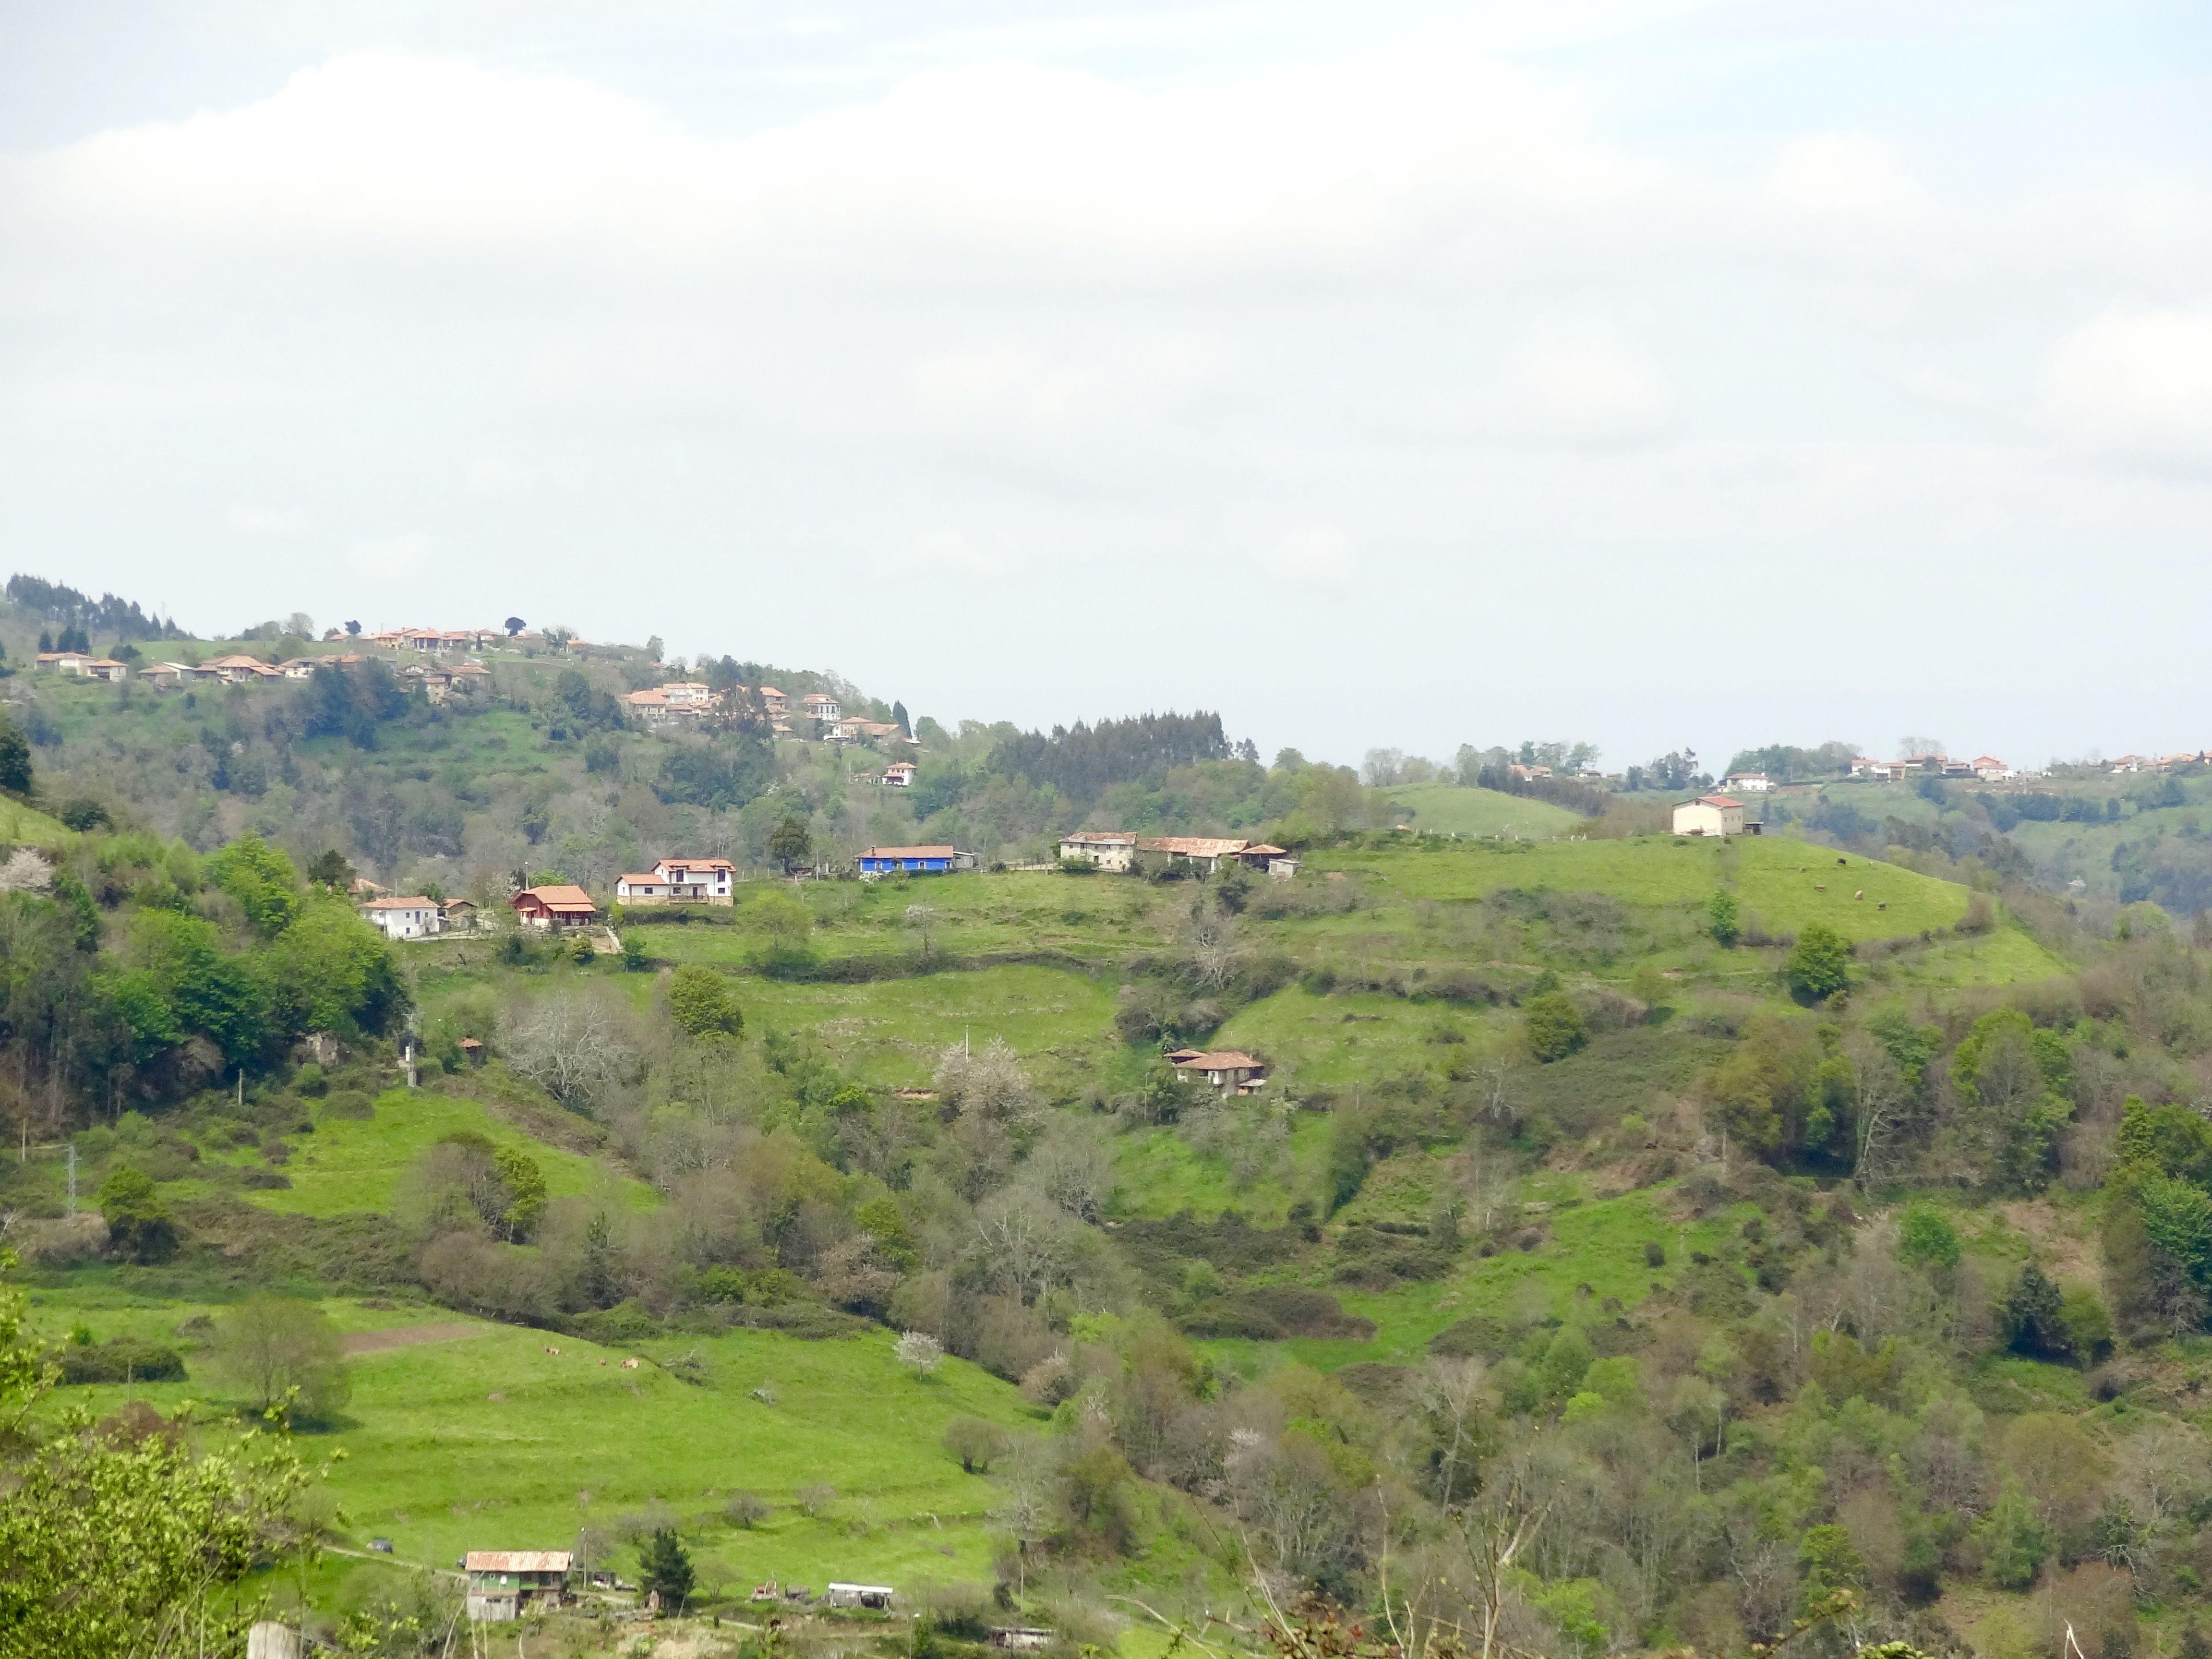 paisaje de monte asturiano en Luexe , Libaron ,Colunga - ASTURIAS . Spain